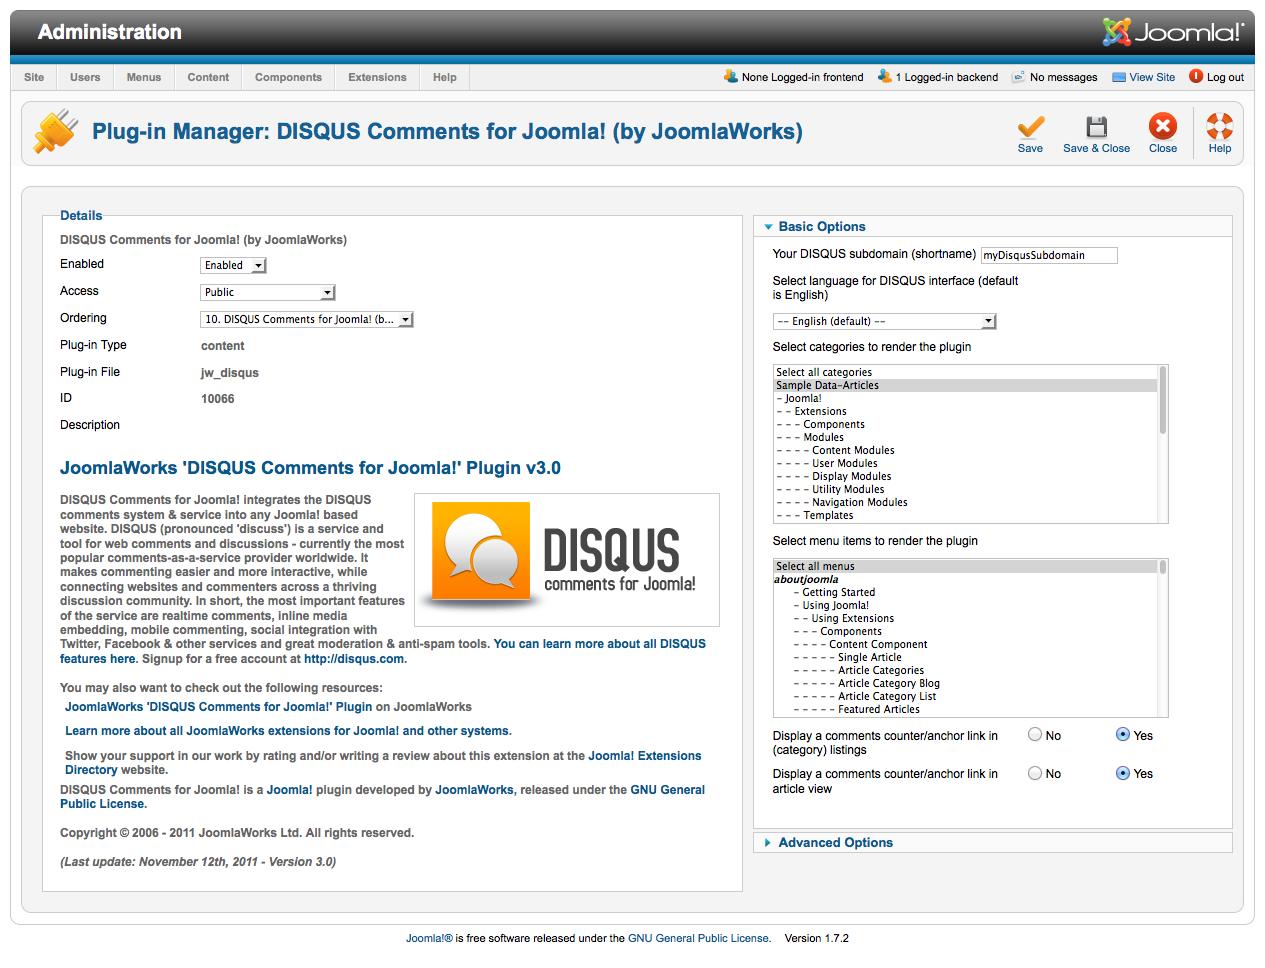 Disqus Comments (for Joomla) - JoomlaWorks